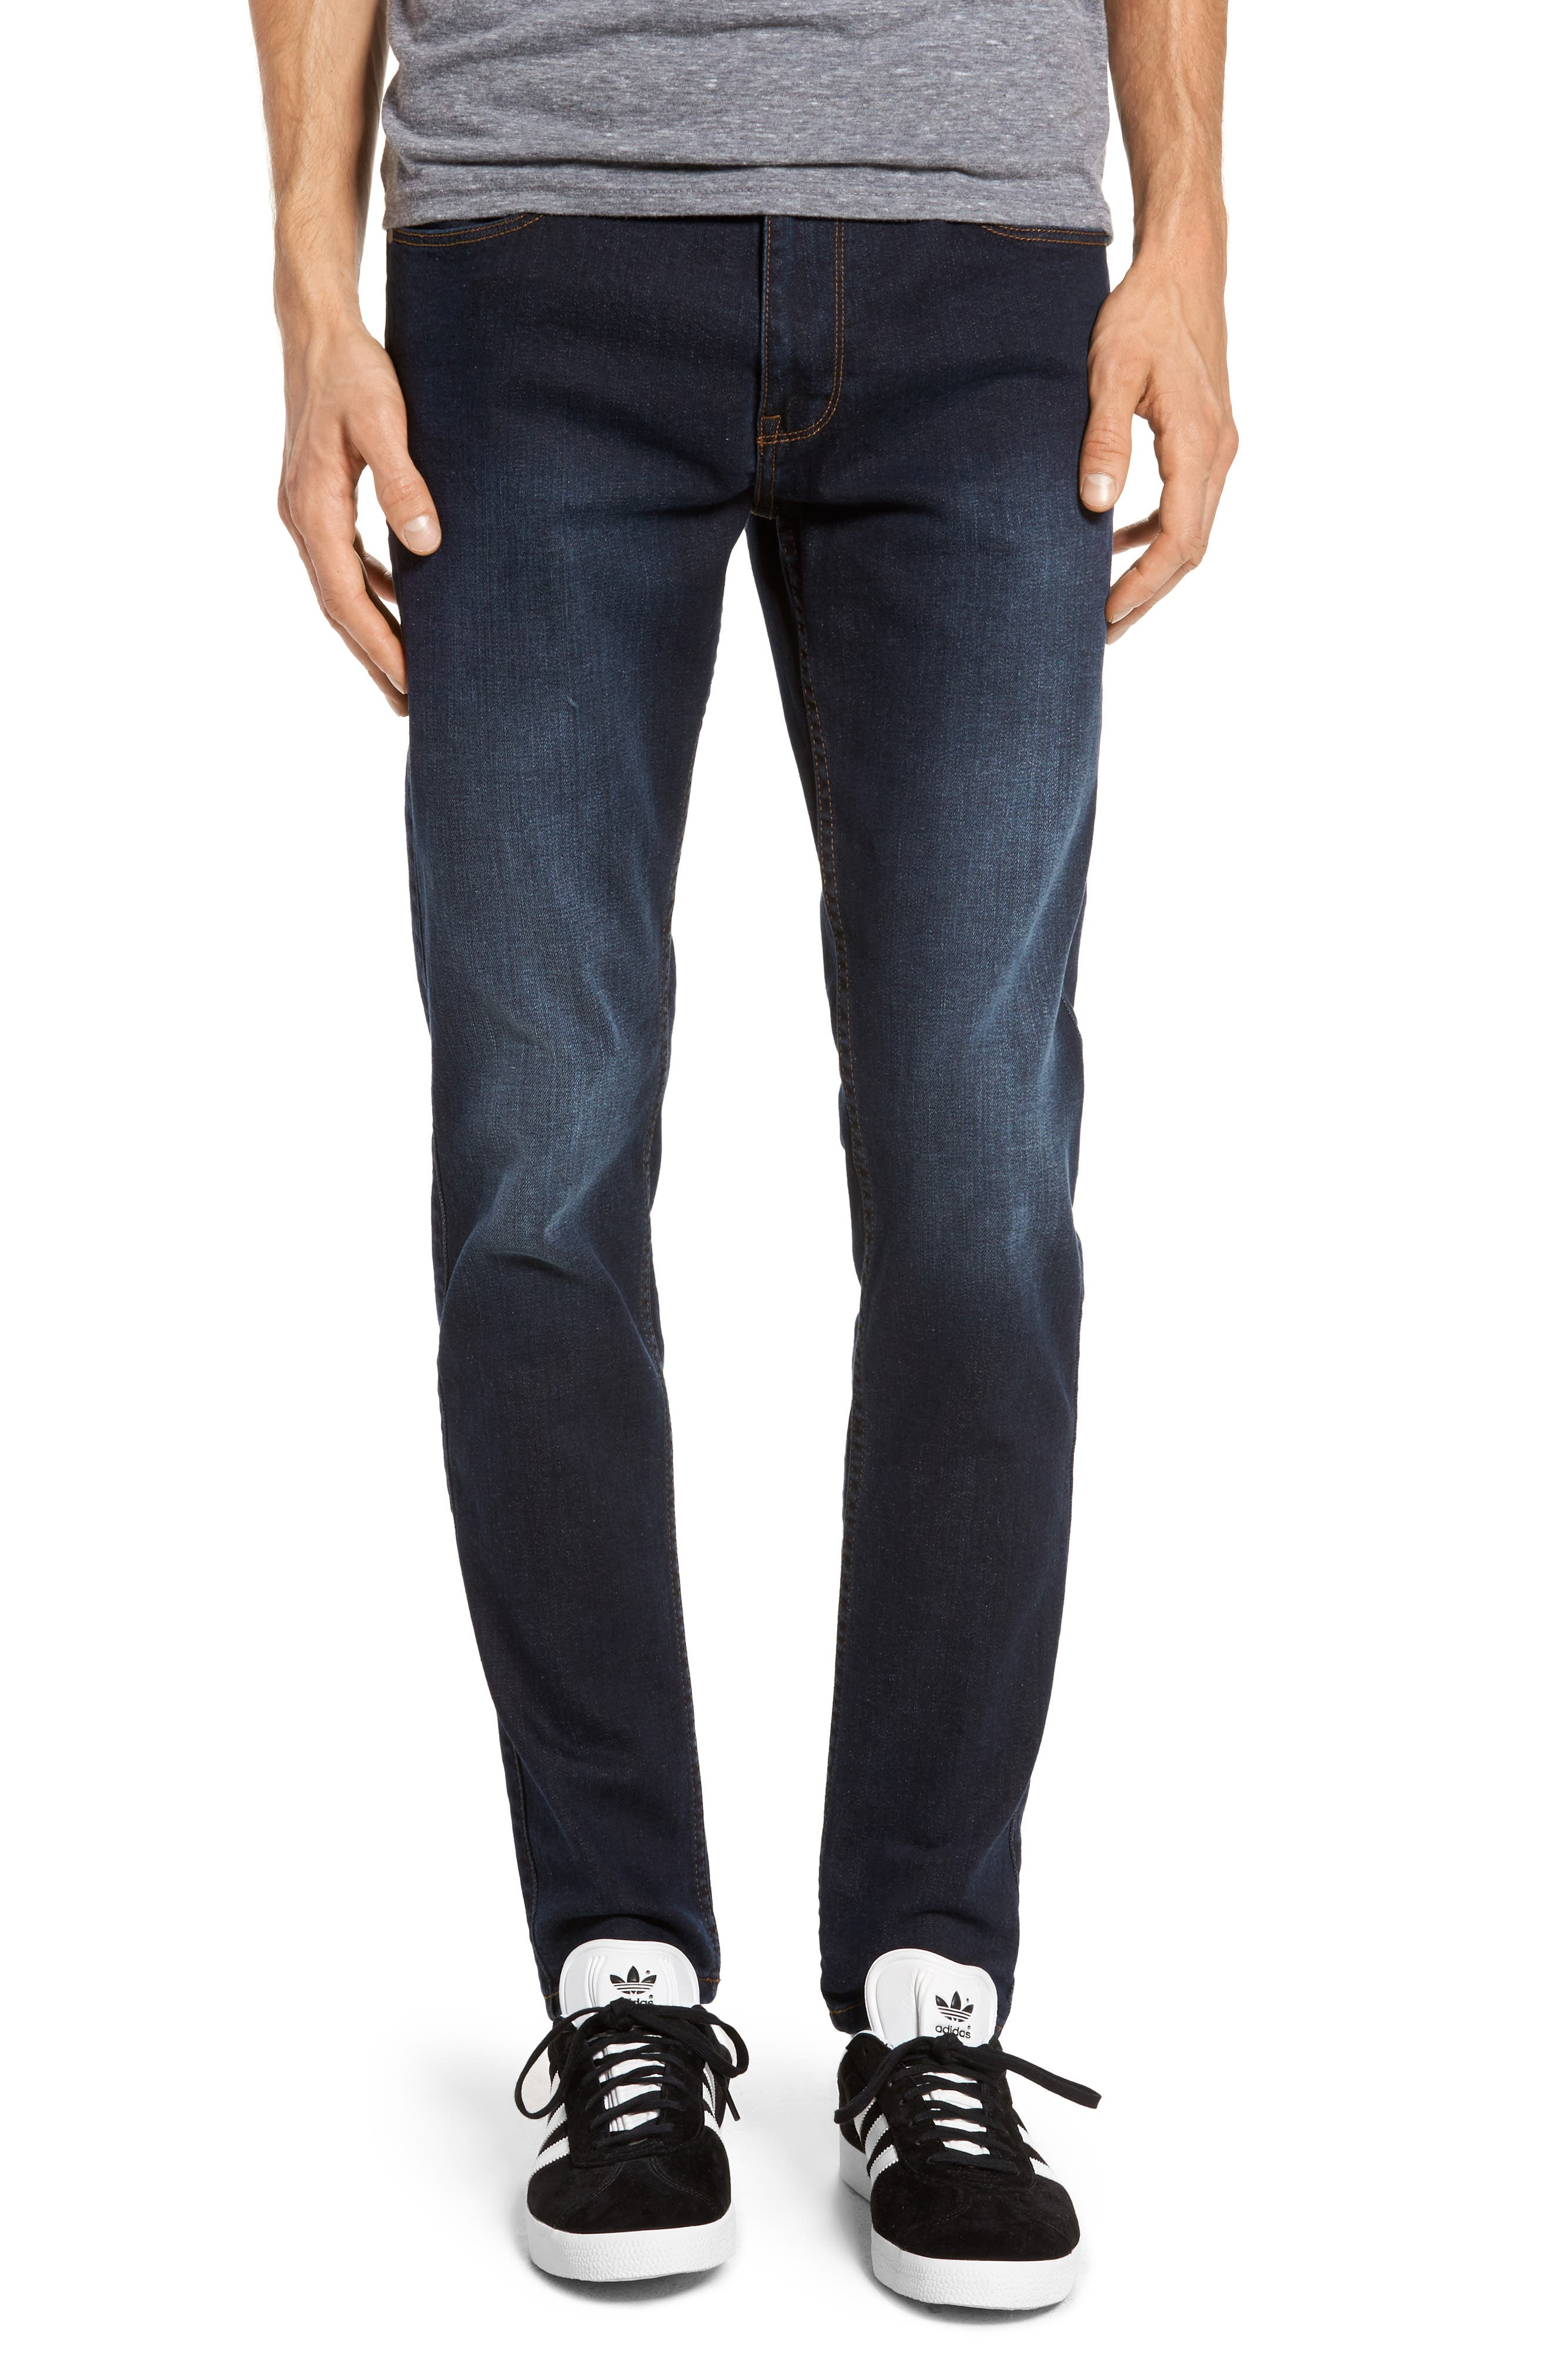 Clark Sim Straight Fit Jeans,                             Main thumbnail 1, color,                             Worn Dark Blue